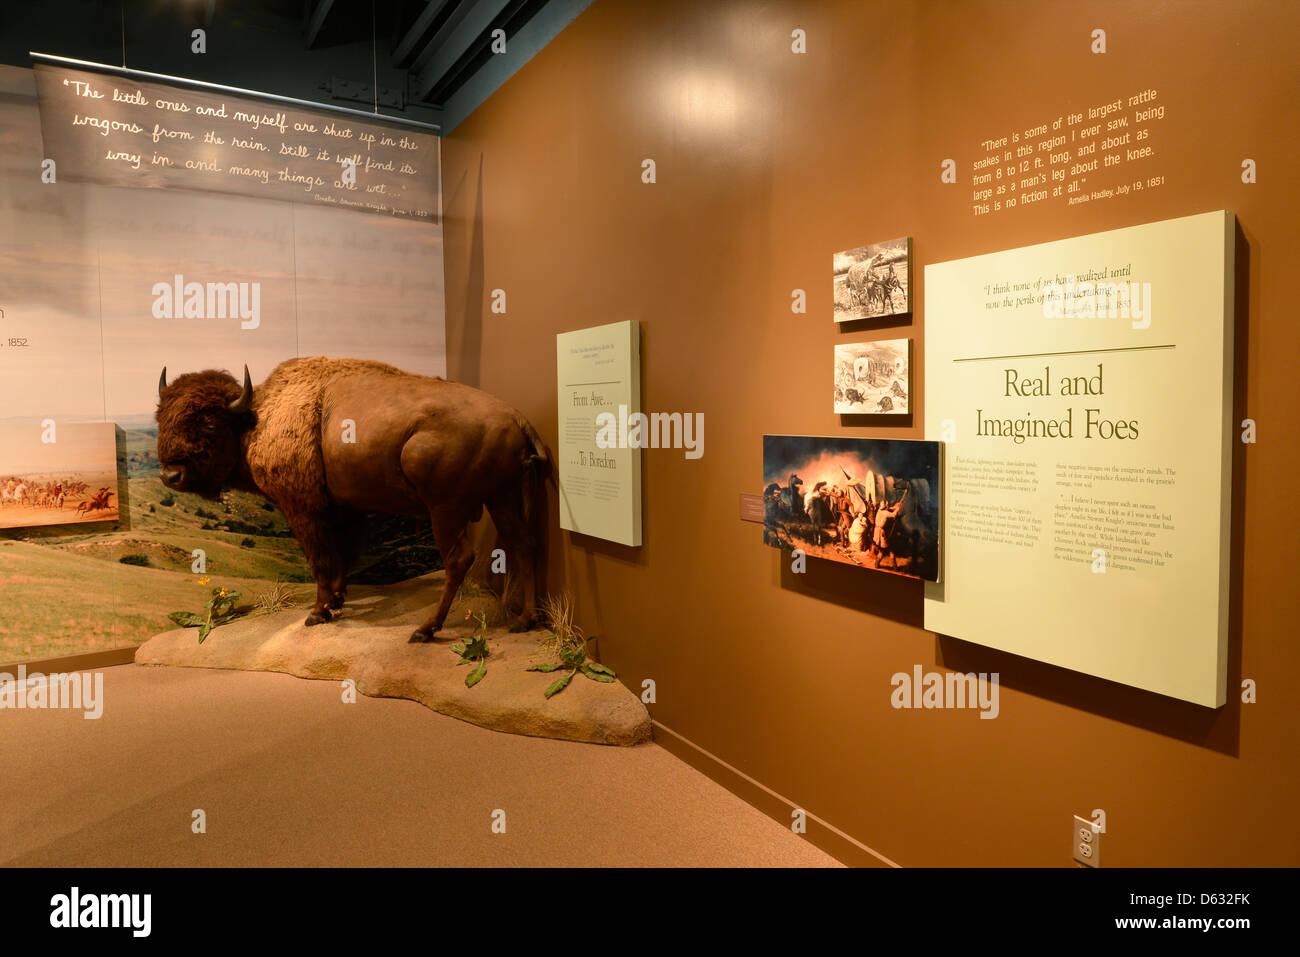 Exhibit in the Oregon Trail Interpretive Center near Baker City, Oregon. - Stock Image